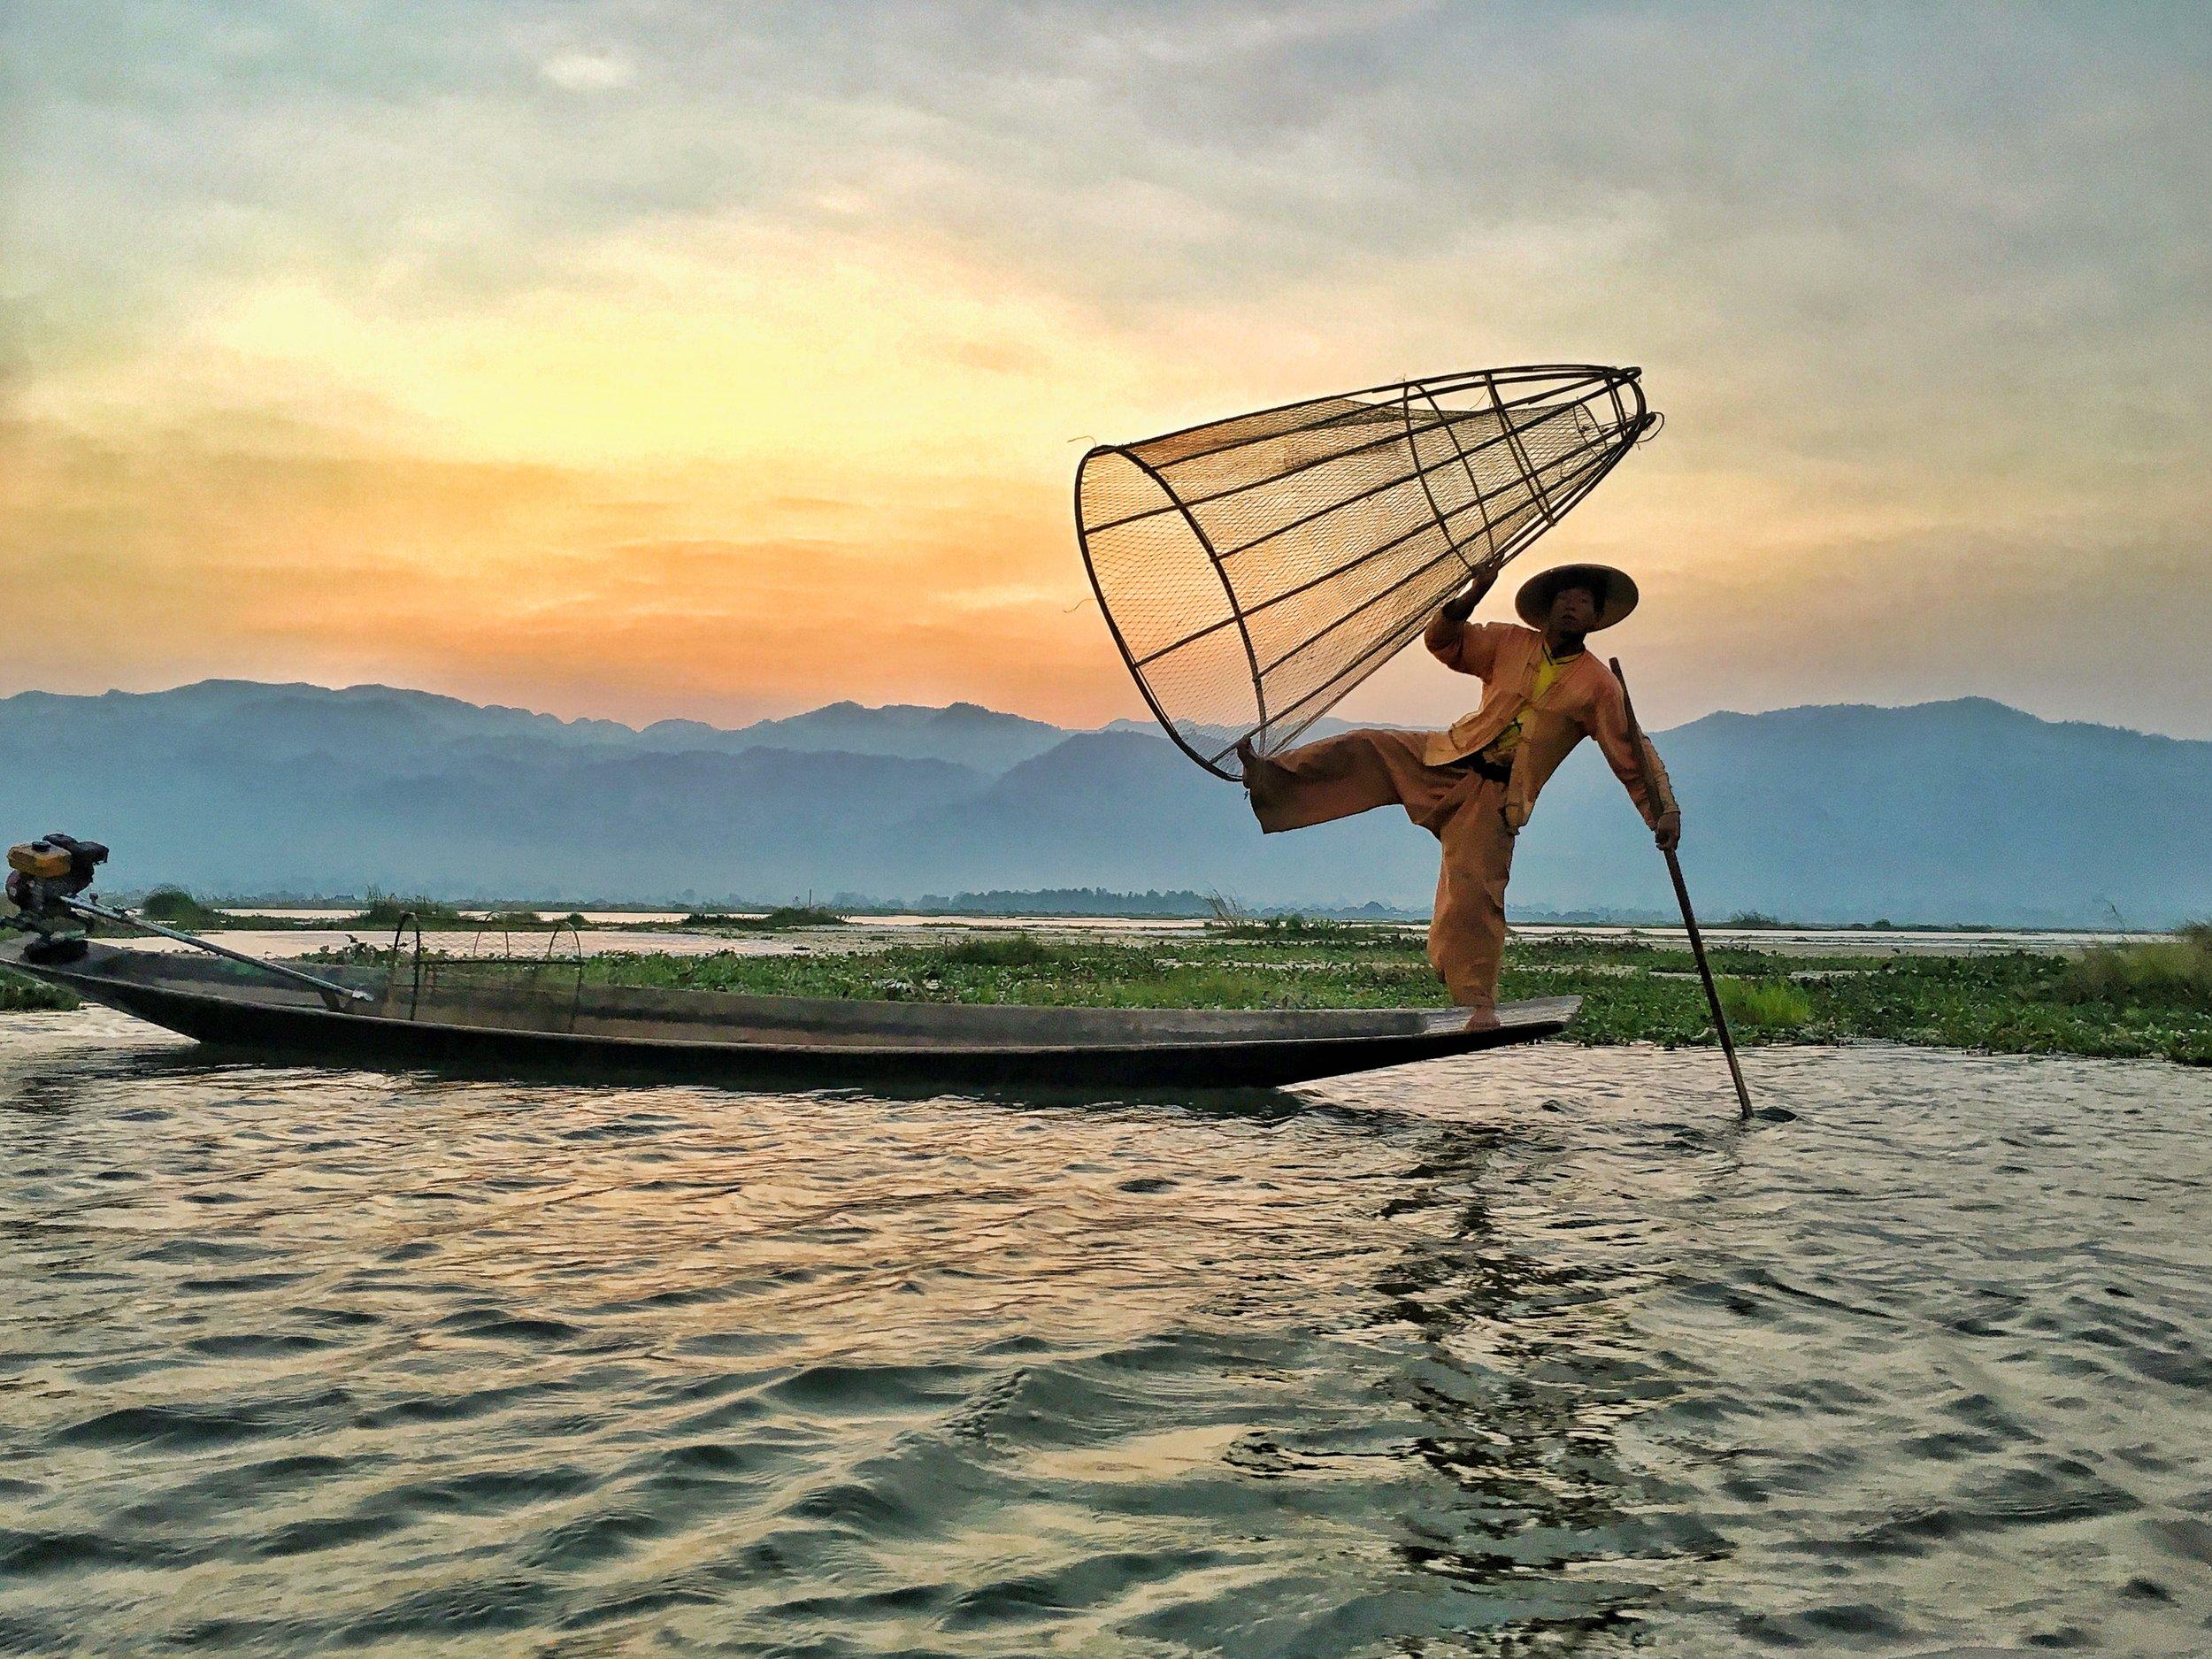 visit Inle Lake's world-famous fishermen